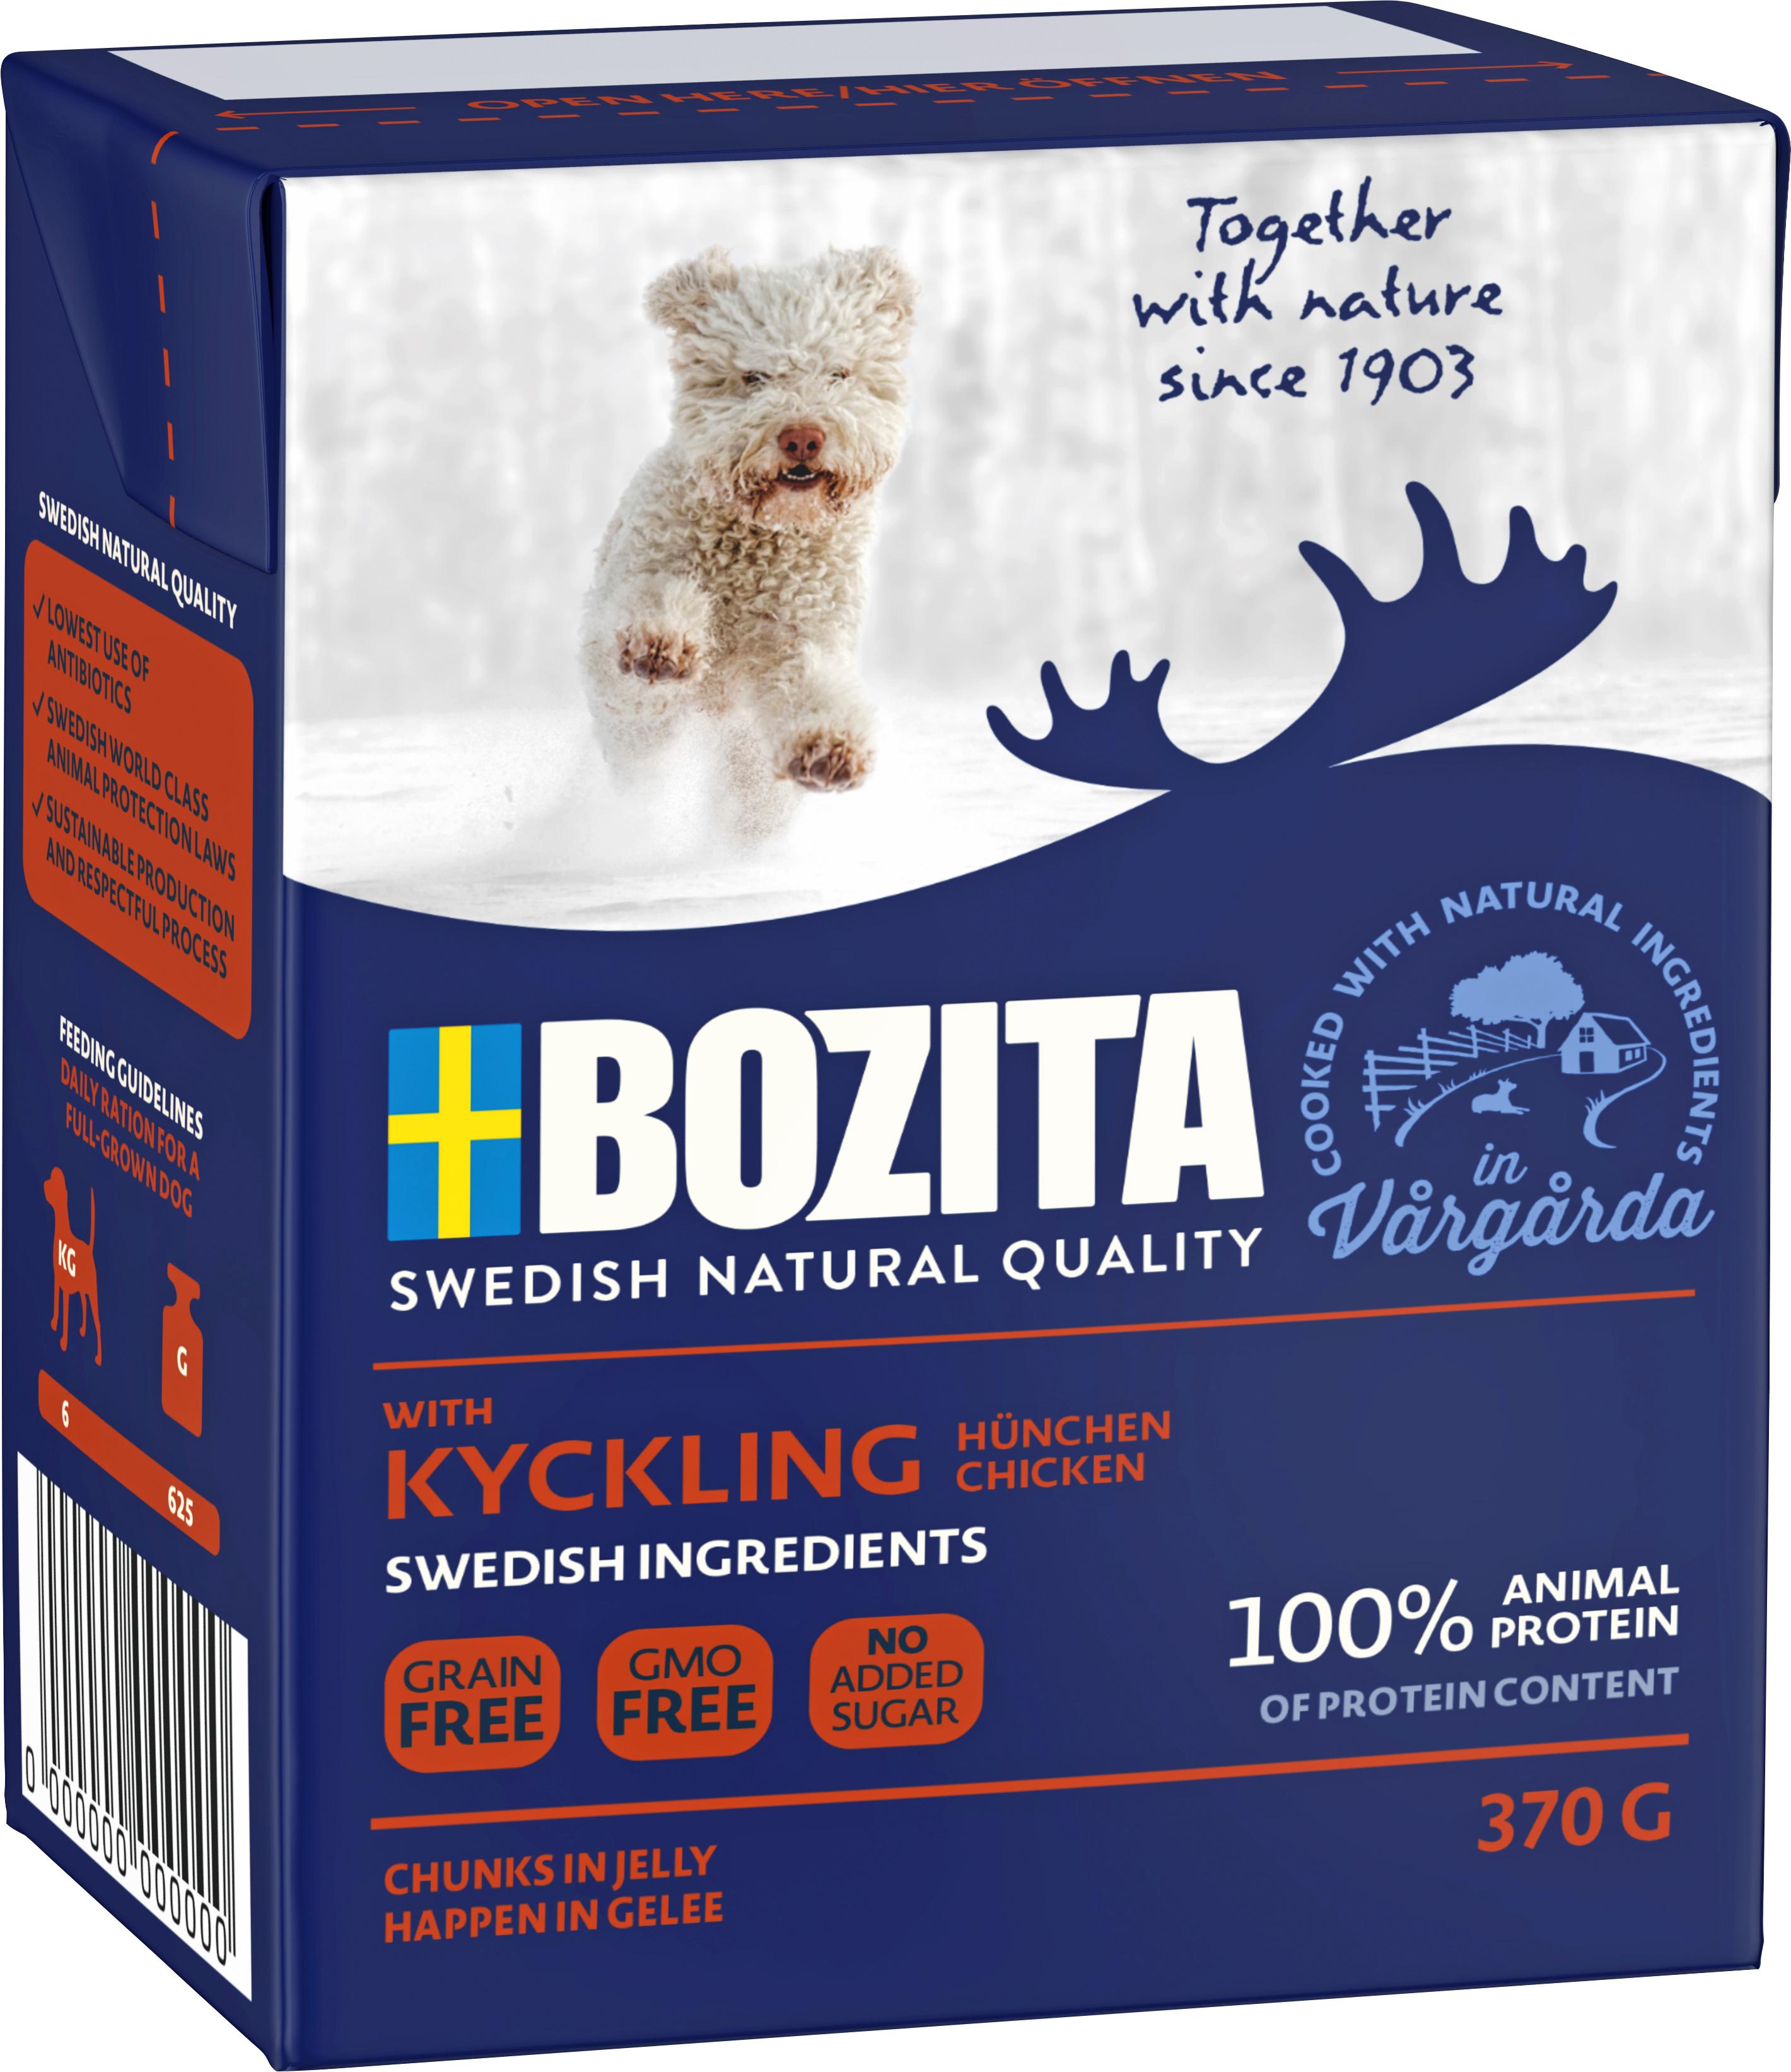 Hundfoder Bozita Tetra Recart Kyckling, 370 g